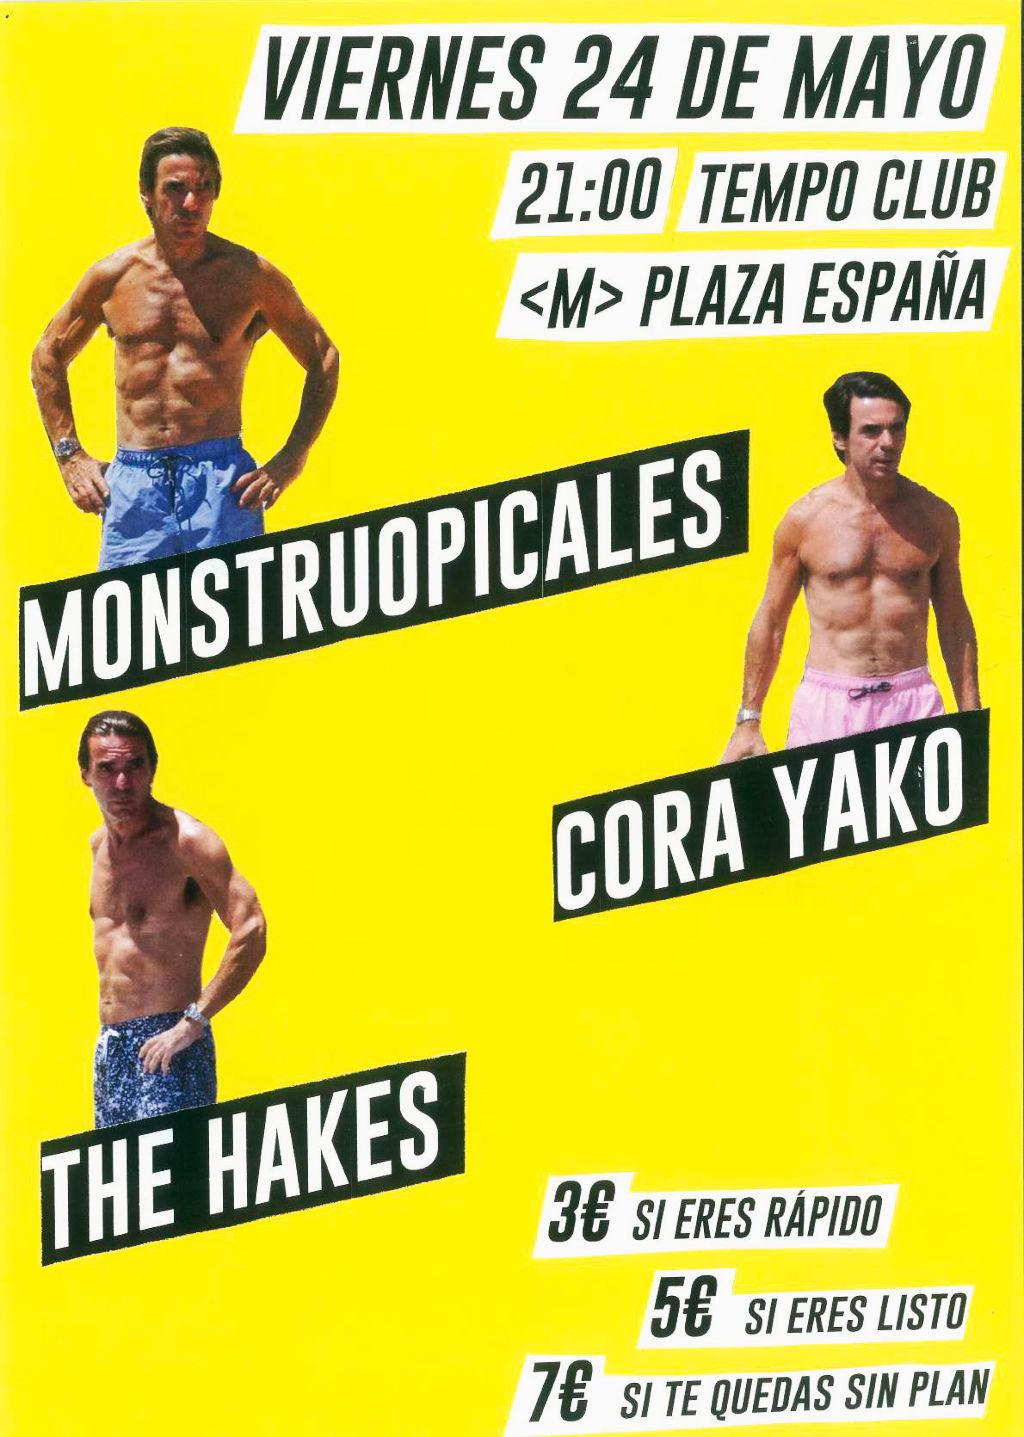 Monstruopicales + Cora Yako + The Hakes